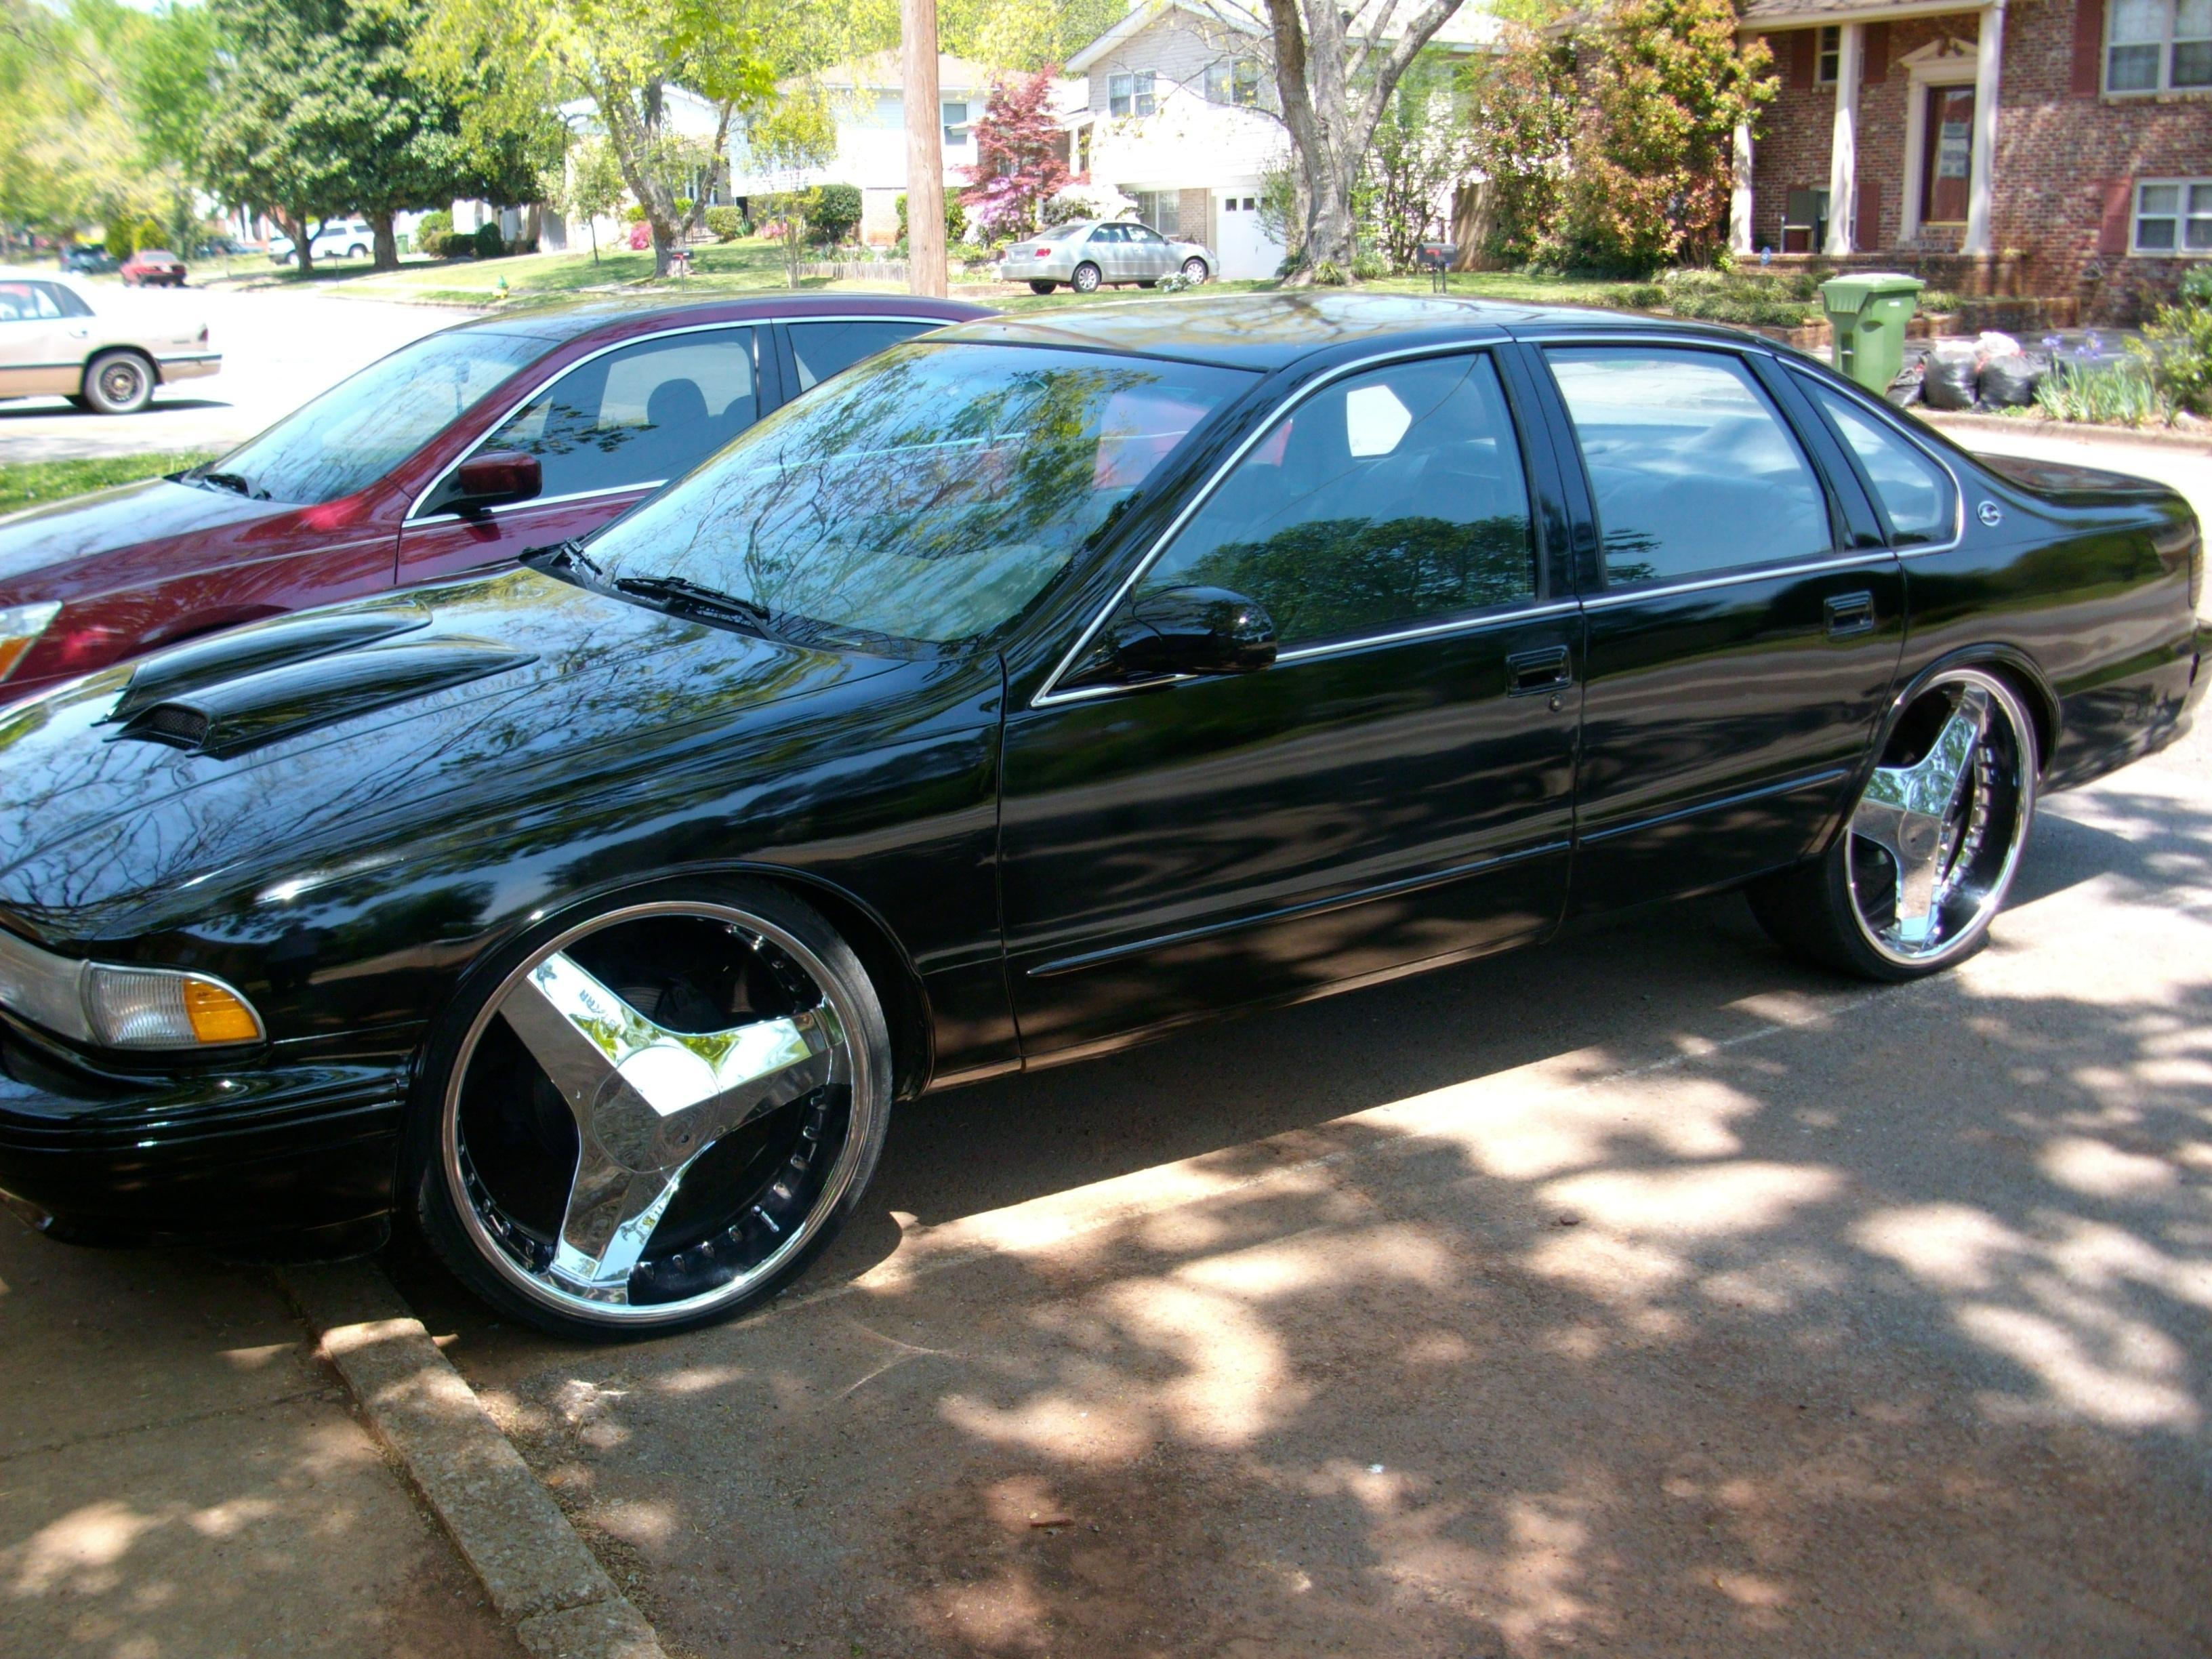 1995 chevrolet impala information and photos neo drive neo drive